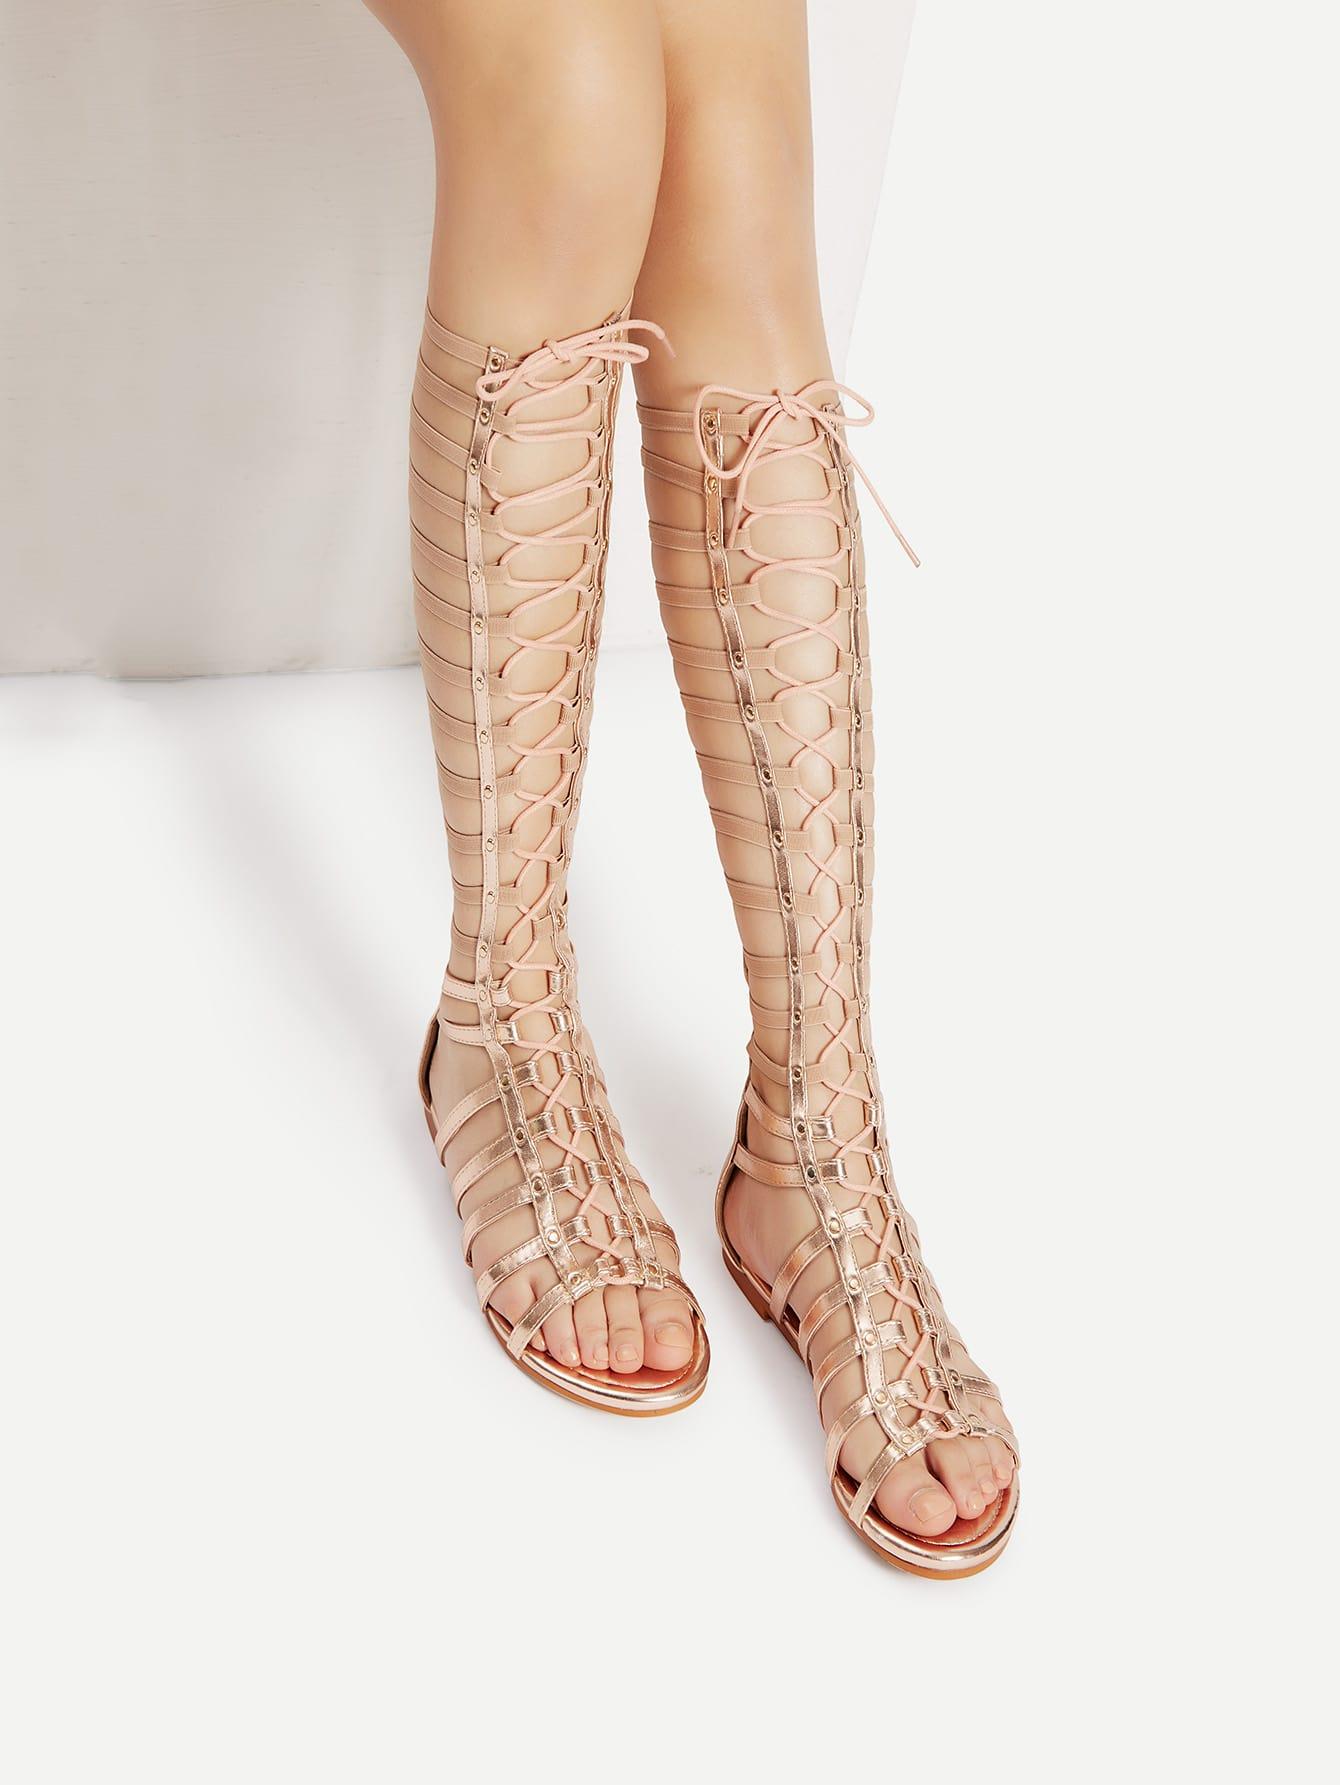 Studded Lace Up Gladiator Sandals ROSEGOLD mmcsandal-candice57m-rosegold